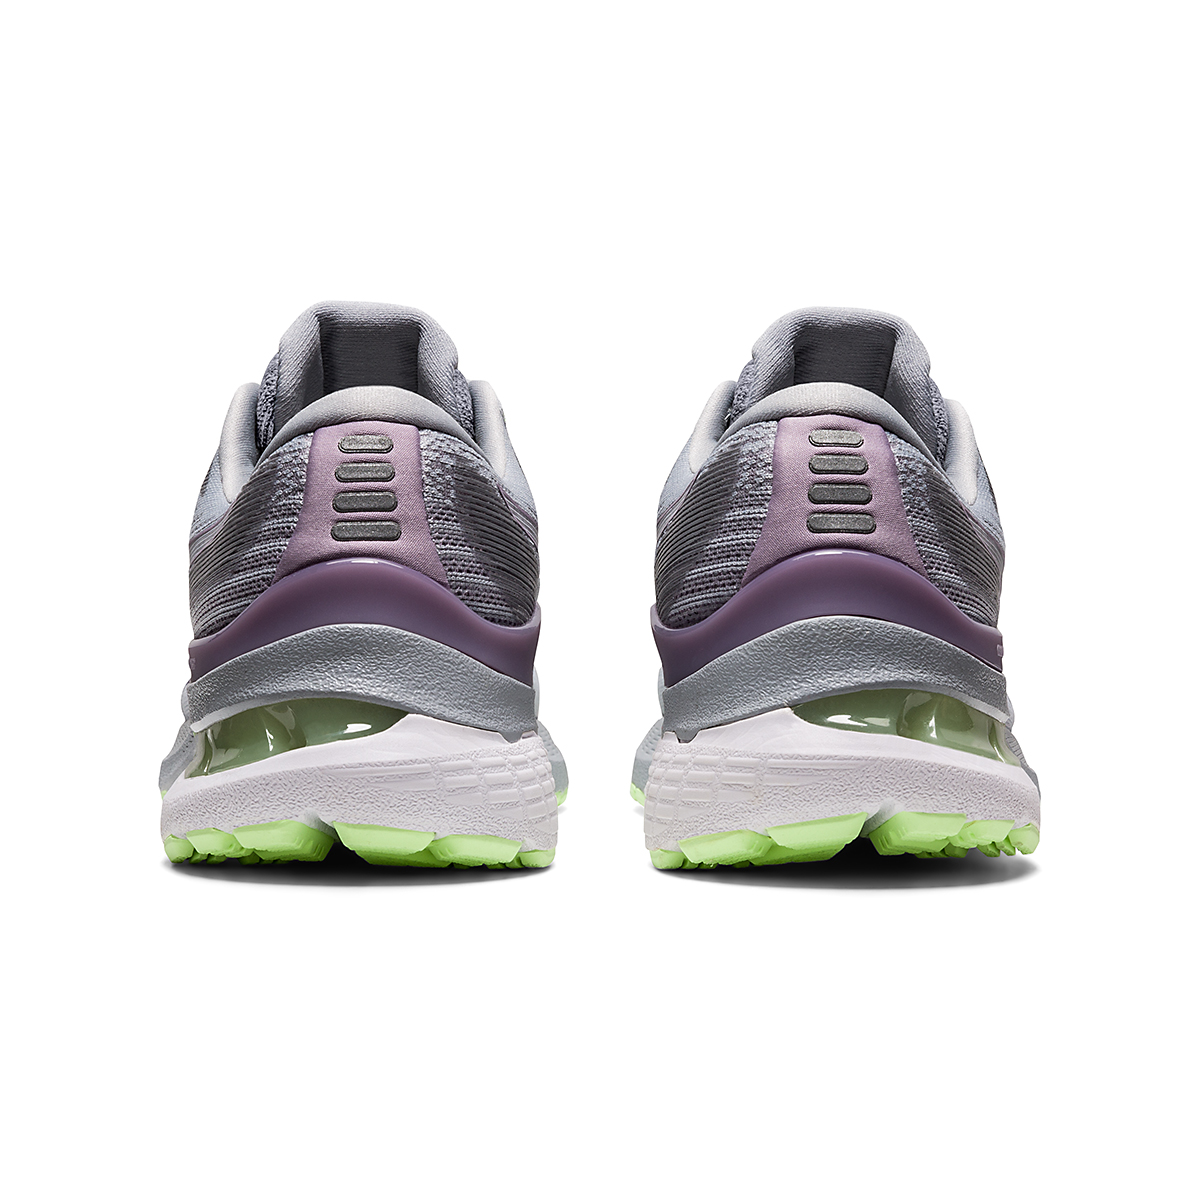 Women's Asics Gel-Kayano 28 Running Shoe - Color: Piedmont Grey/Lavender - Size: 5 - Width: Regular, Piedmont Grey/Lavender, large, image 6